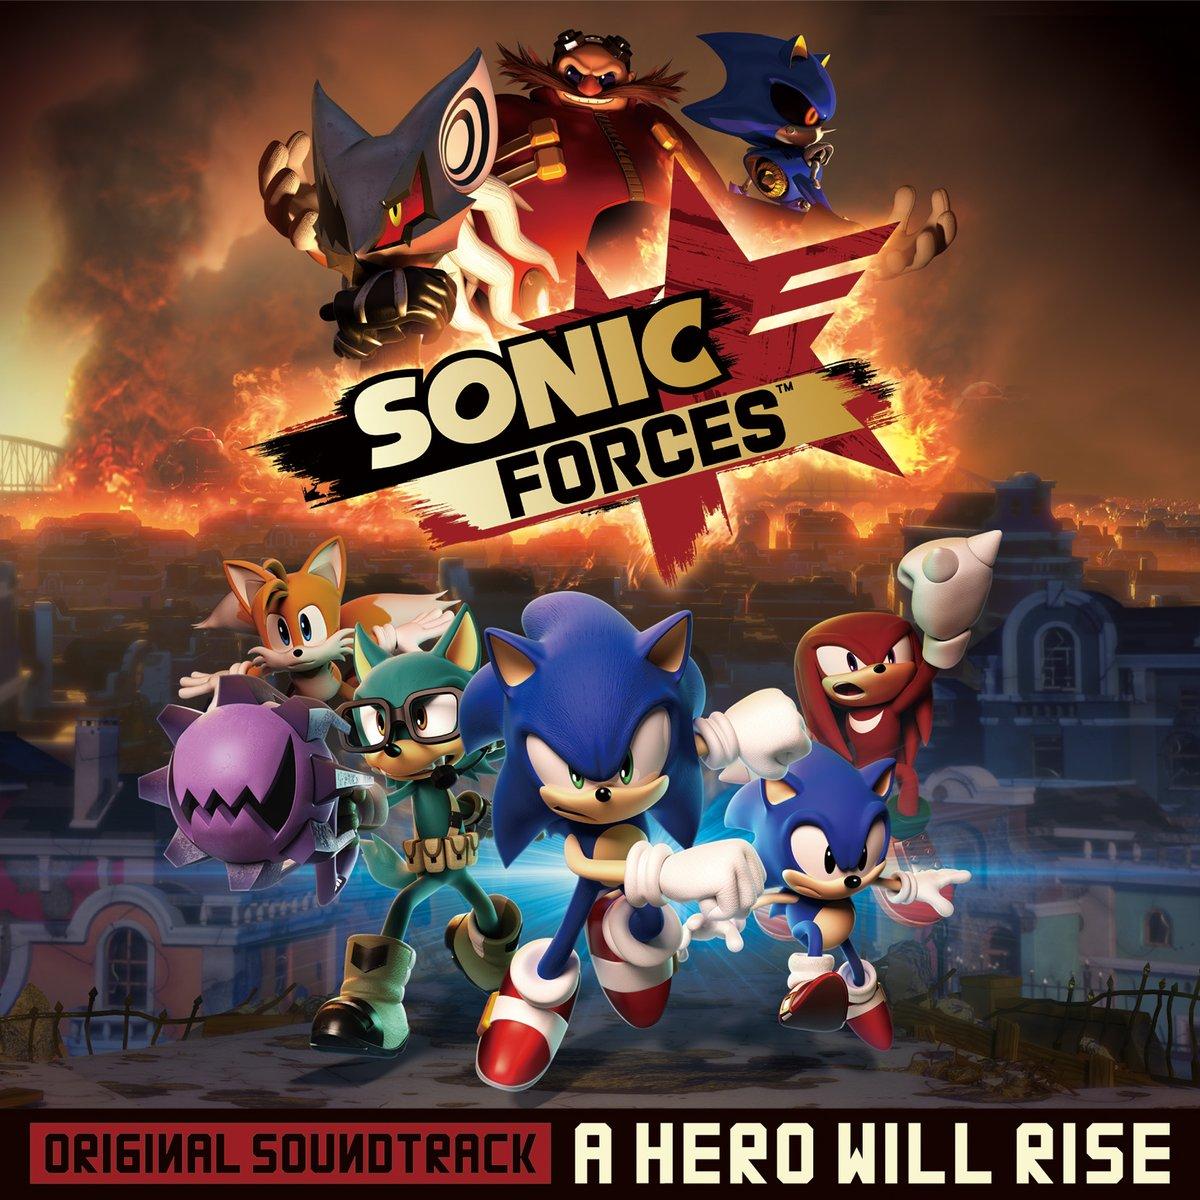 Sonic Forces Fist Bump